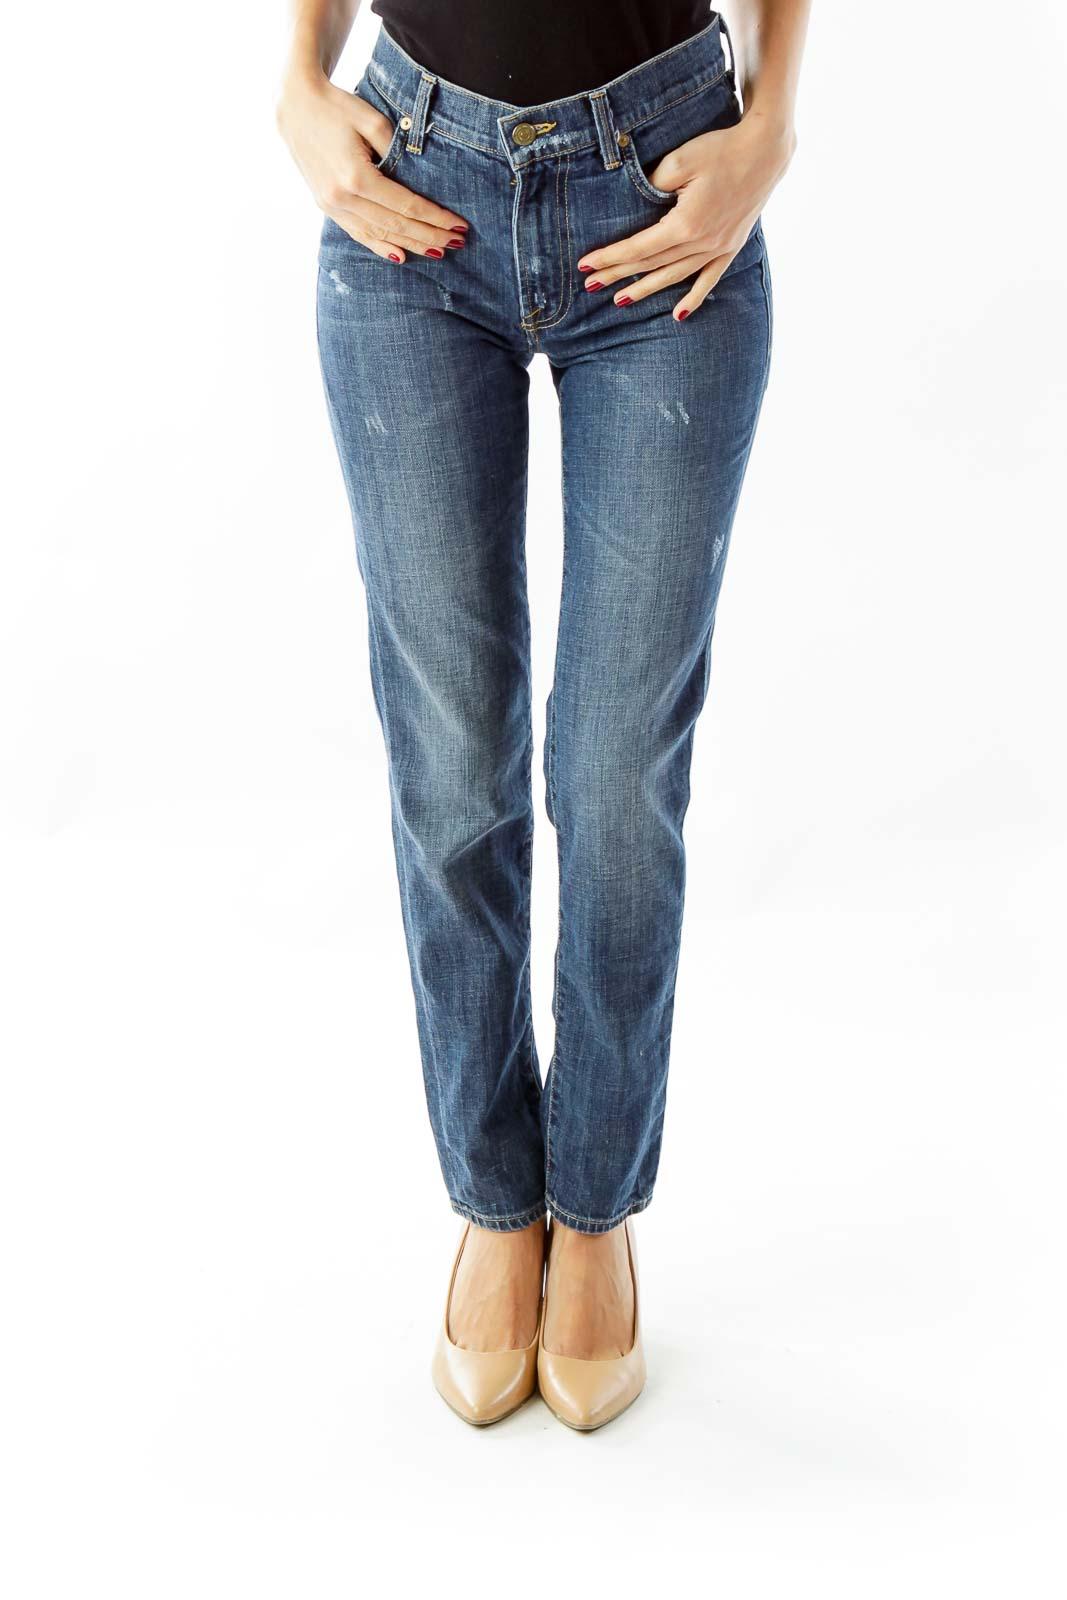 Blue Denim Straight Leg Jeans Front